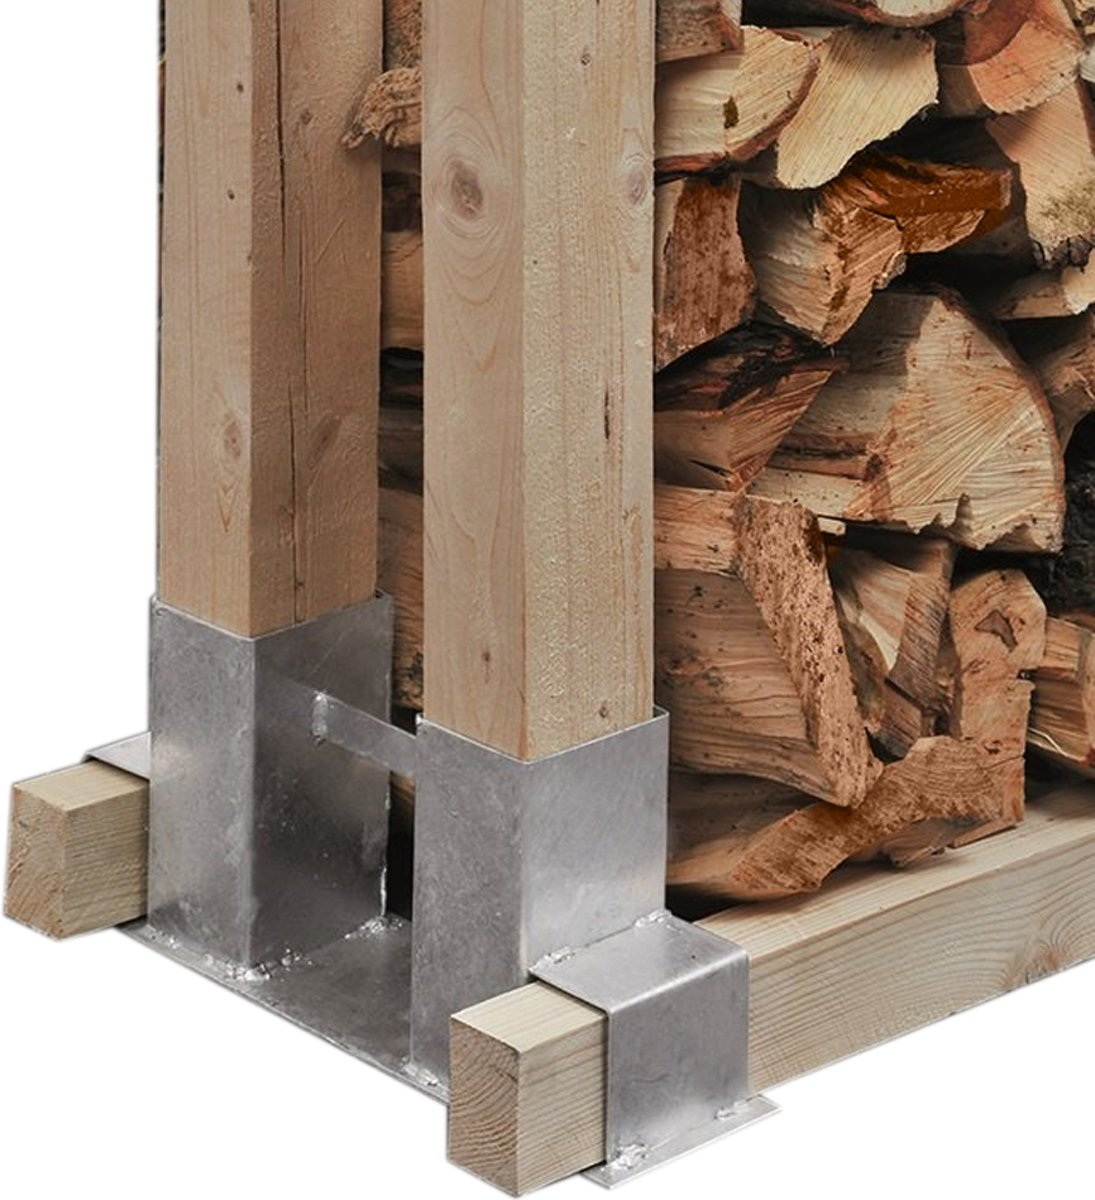 Intergard Houtstapelhouder houtbergingsteun openhaardhout houtberging